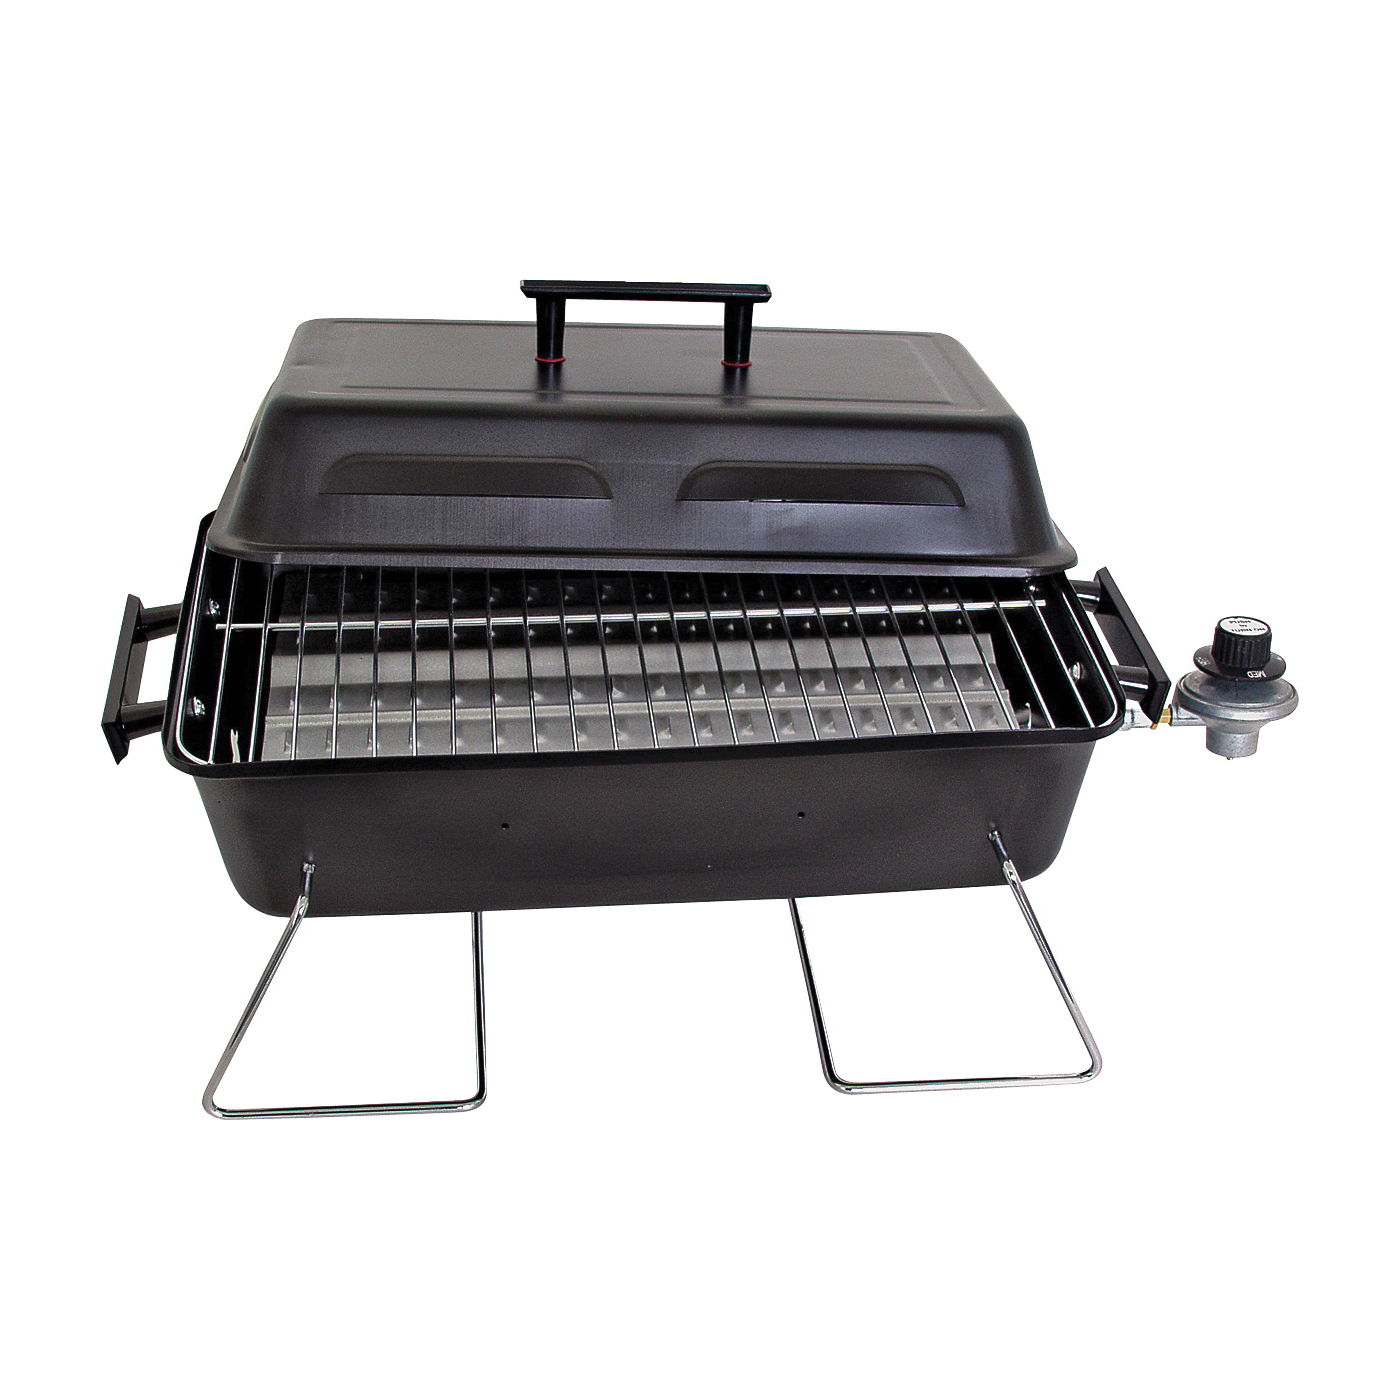 Picture of Char-Broil 465133010 Gas Grill, 11000 Btu BTU, 1 -Burner, Steel Body, Black